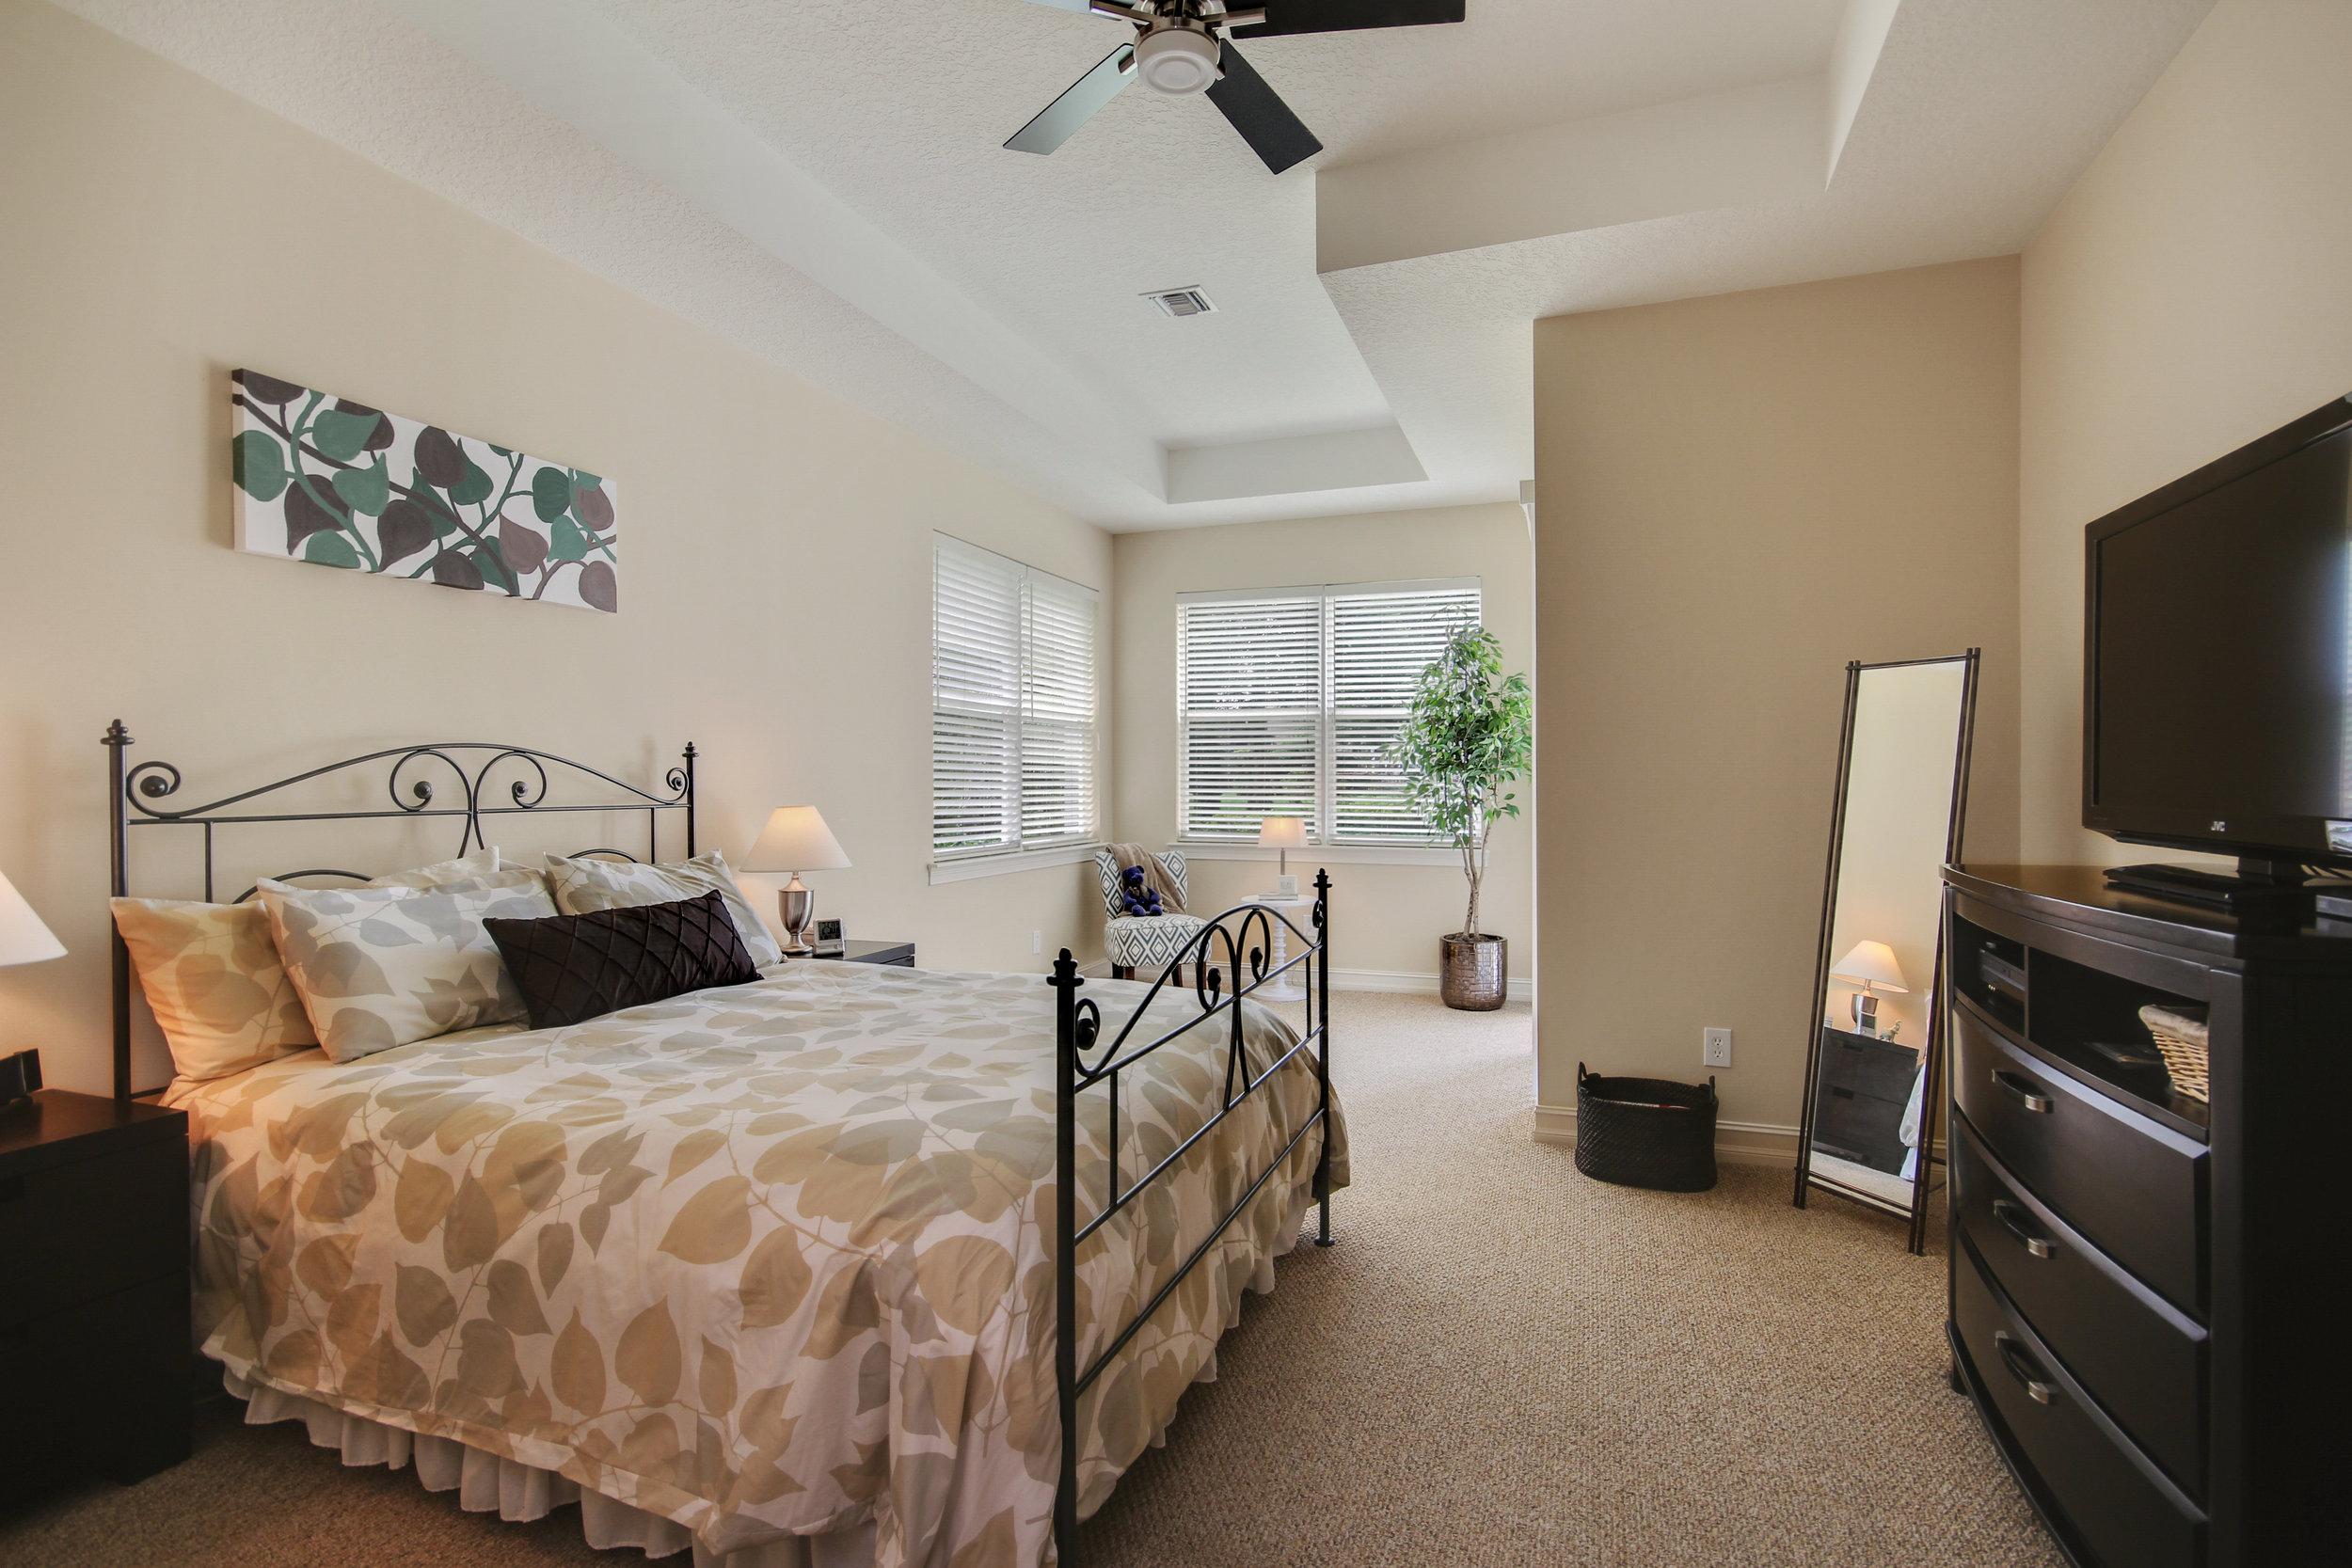 4_bedroom1.jpg